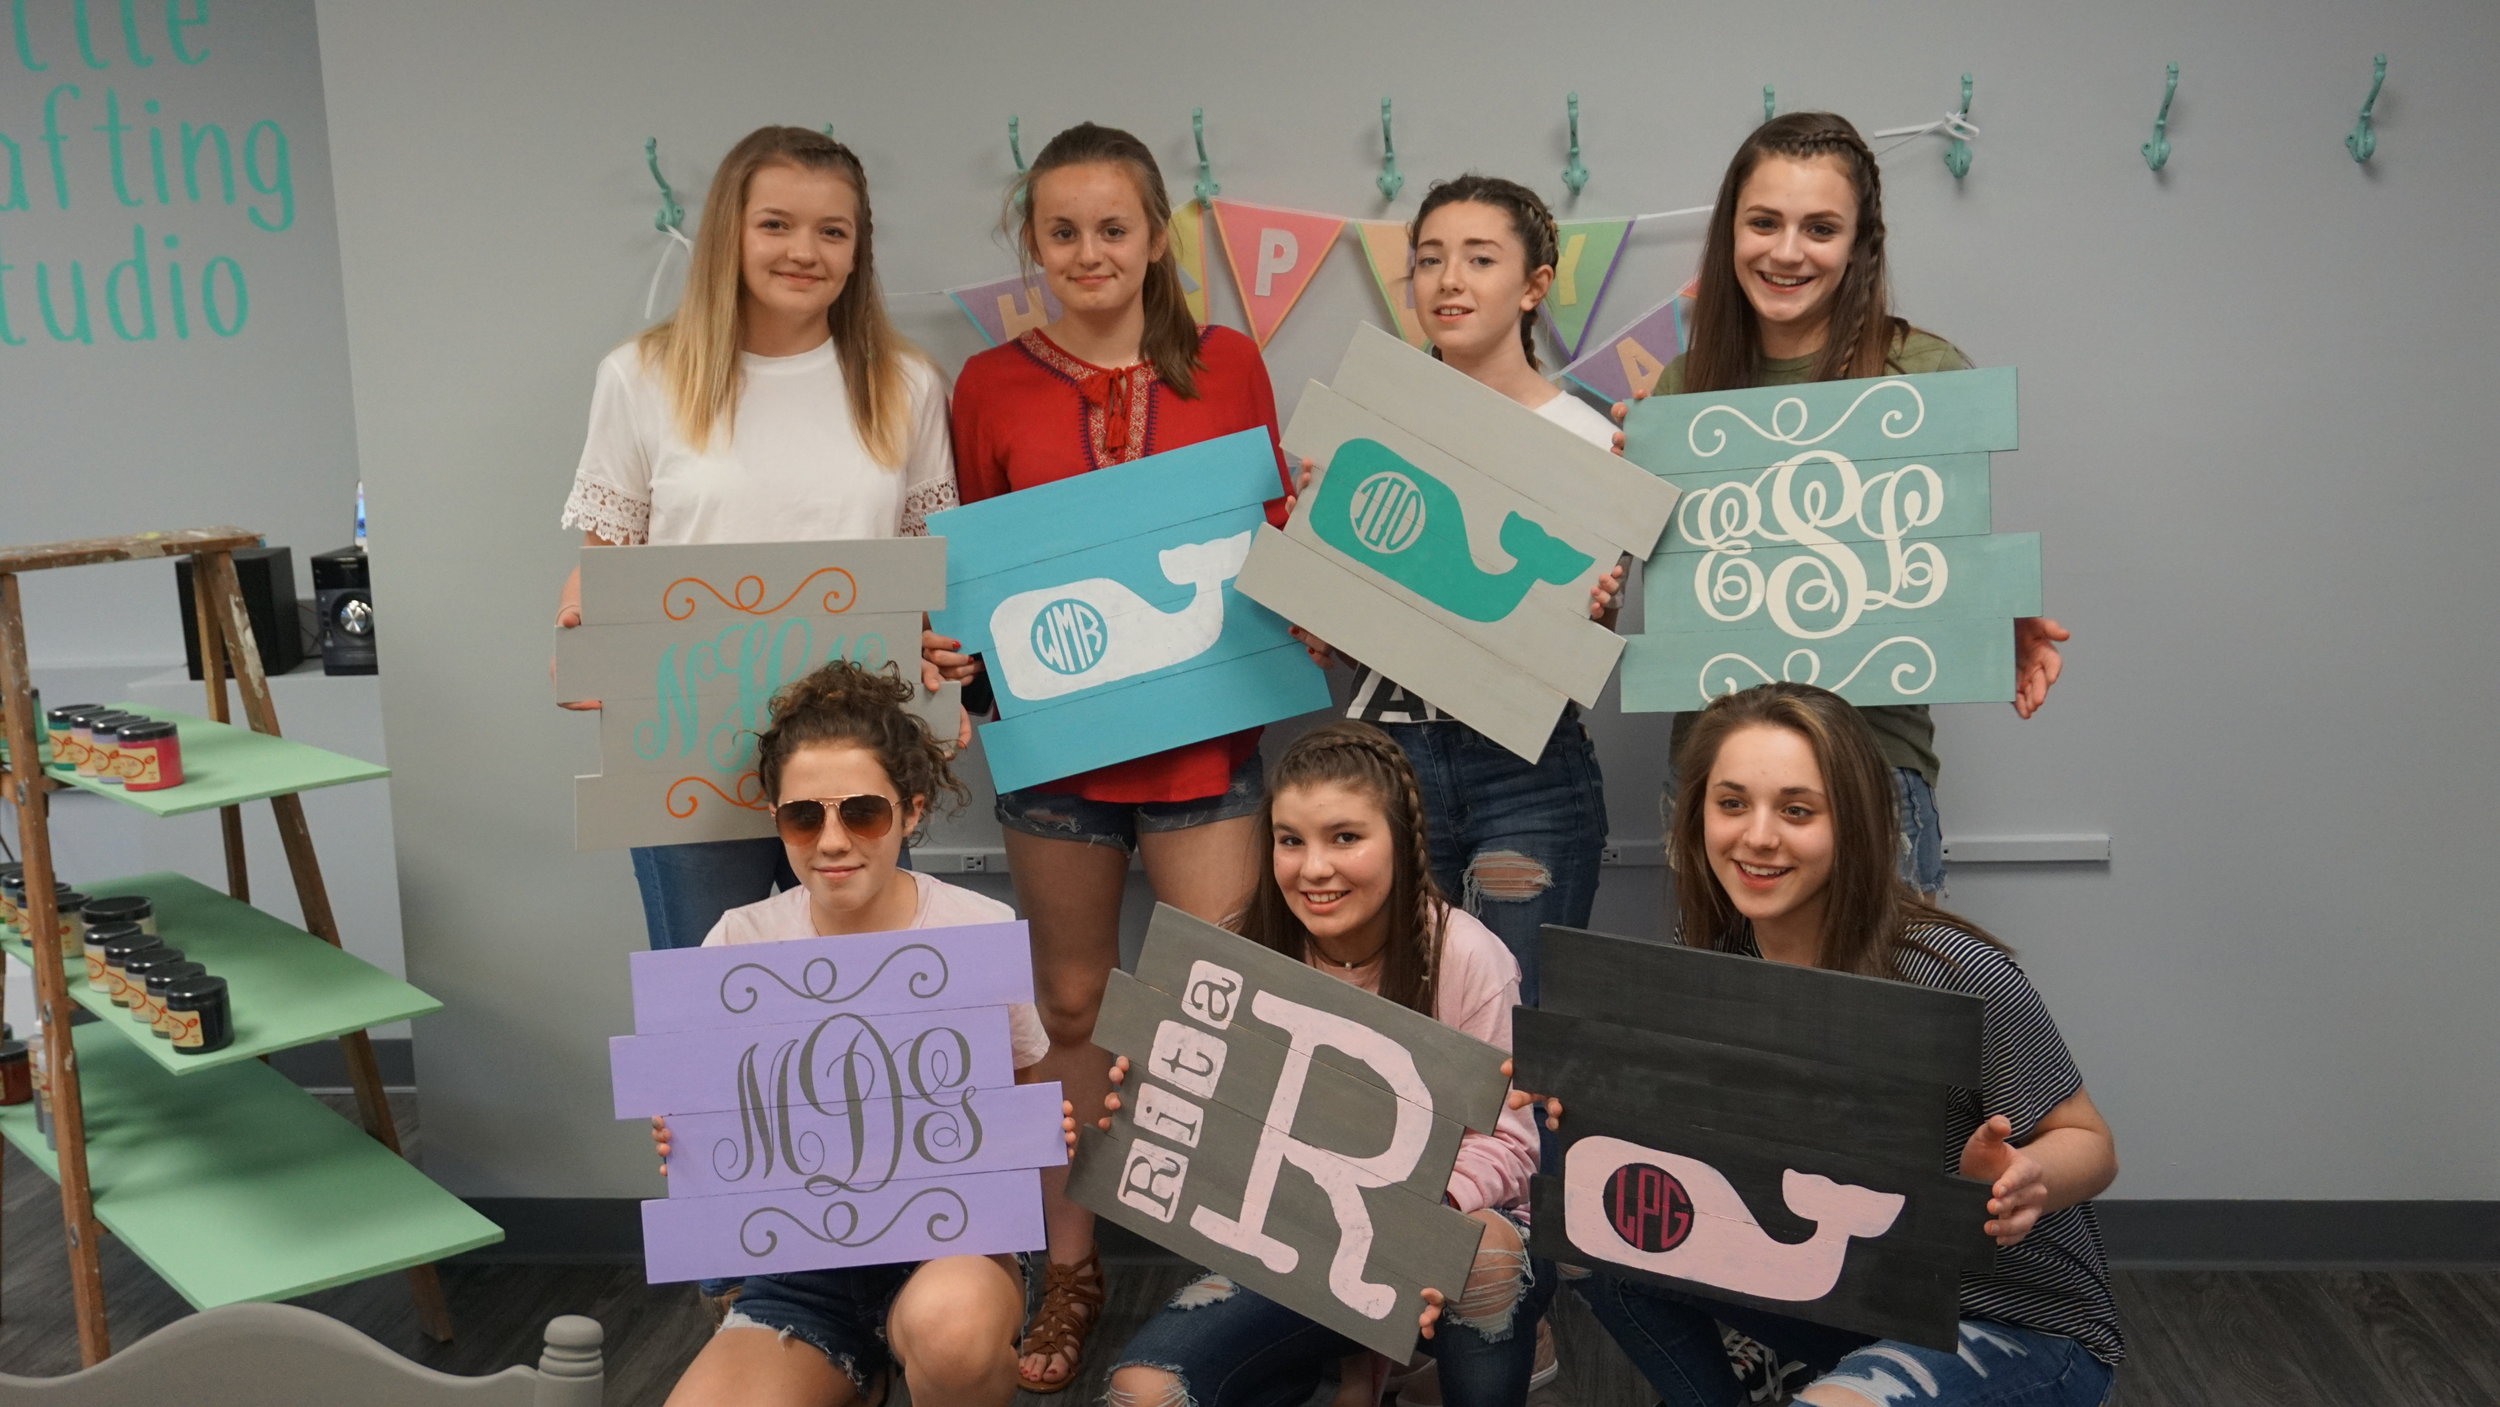 We do teen and preteen birthday parties! -